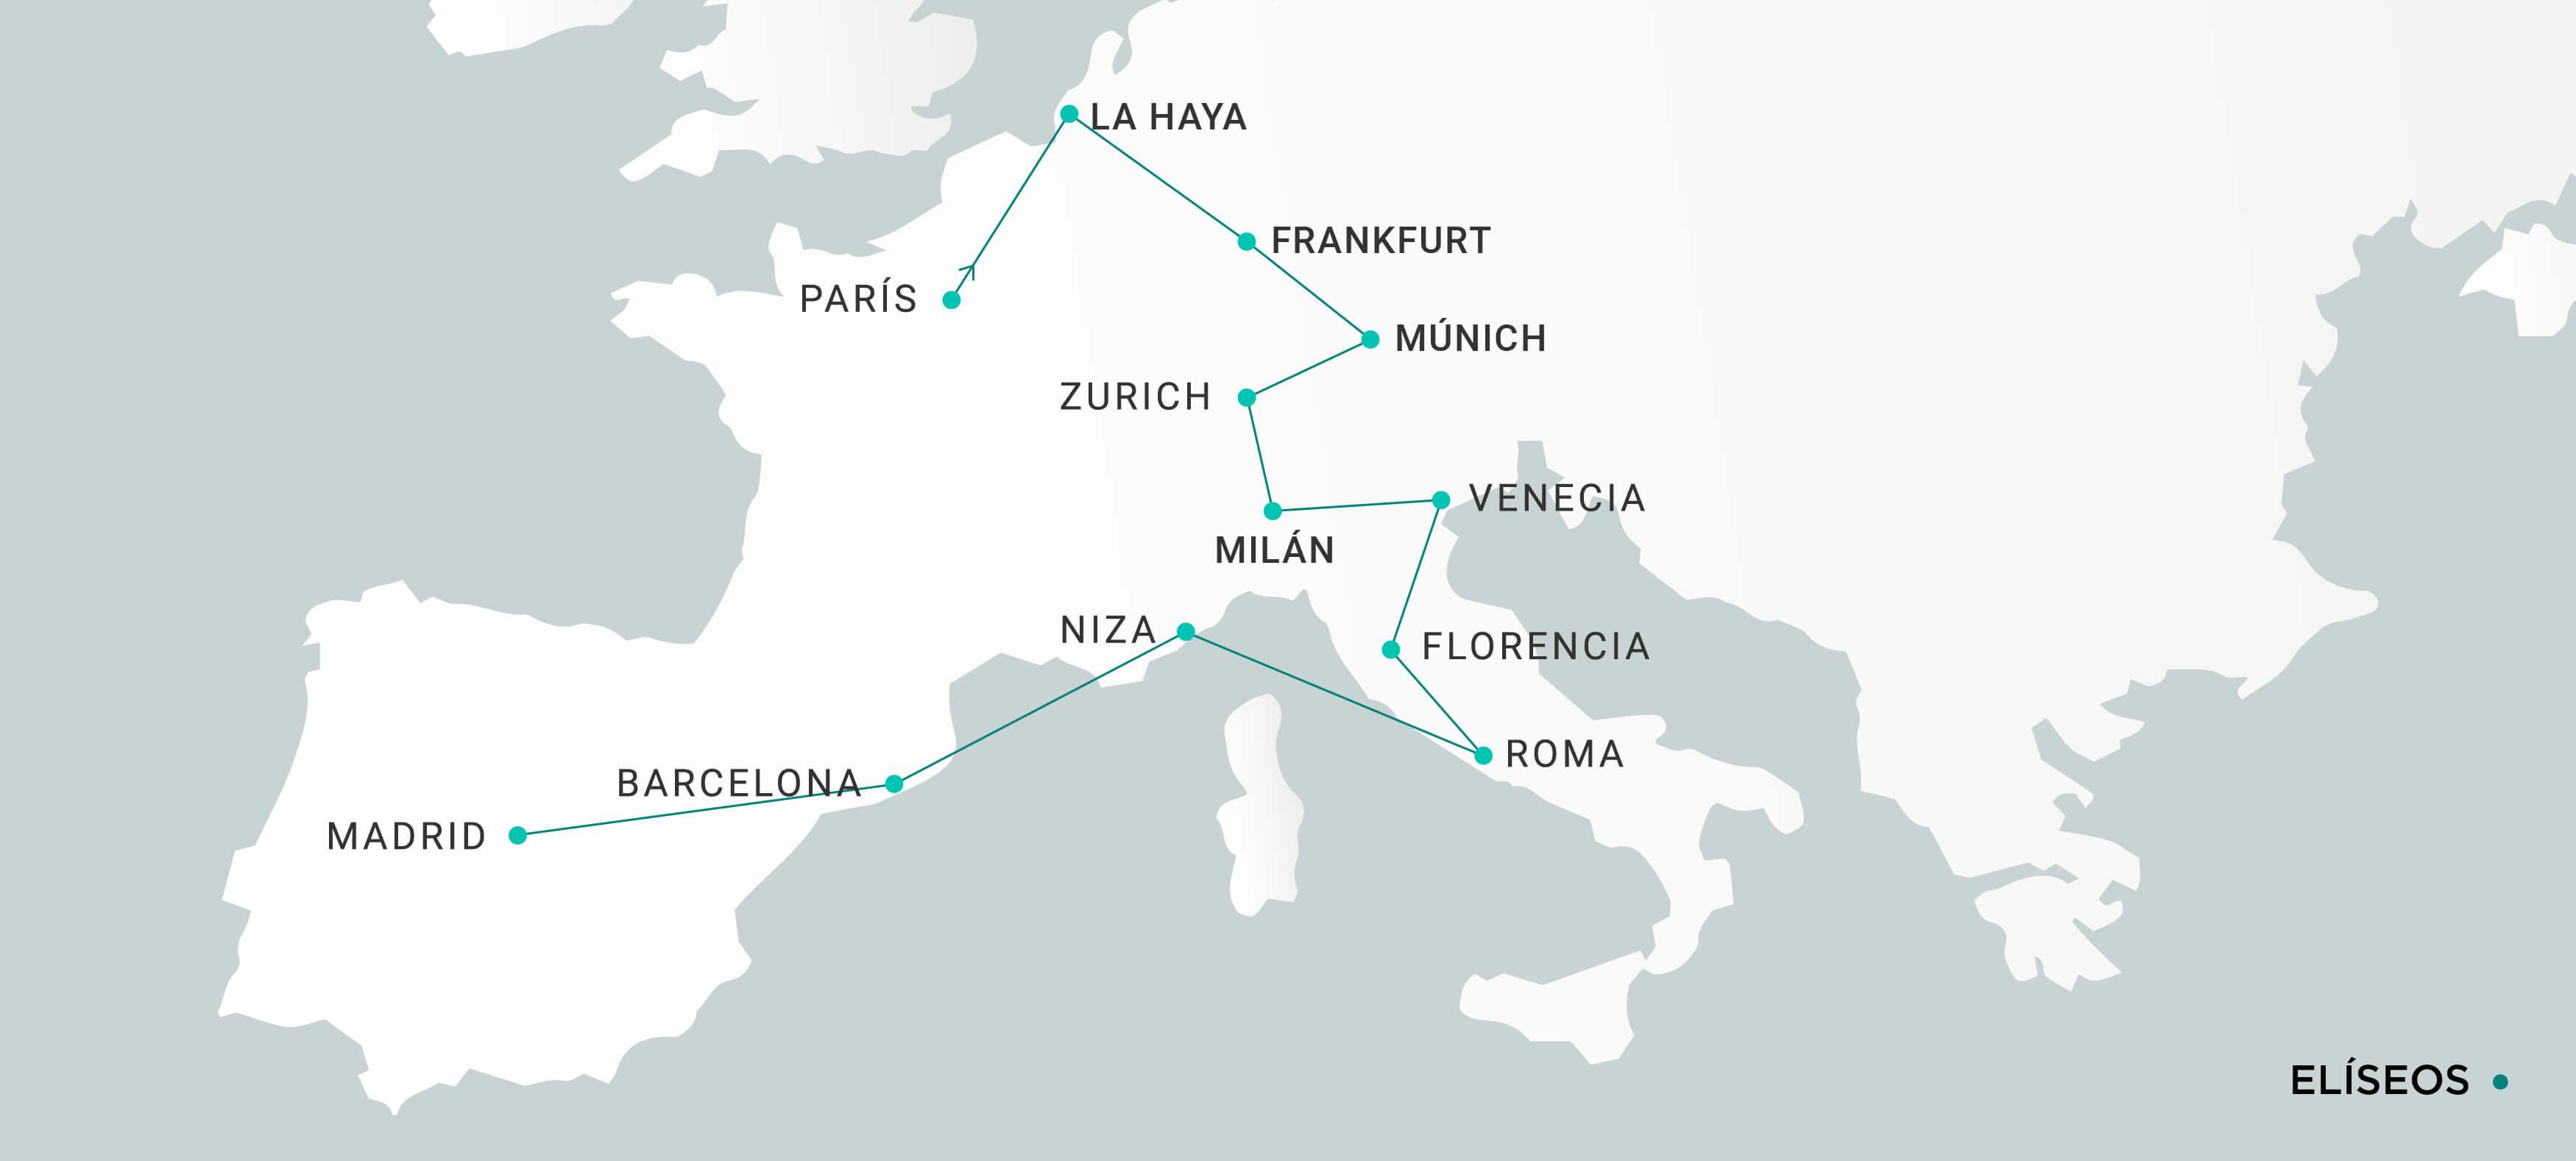 Mapa Elíseos